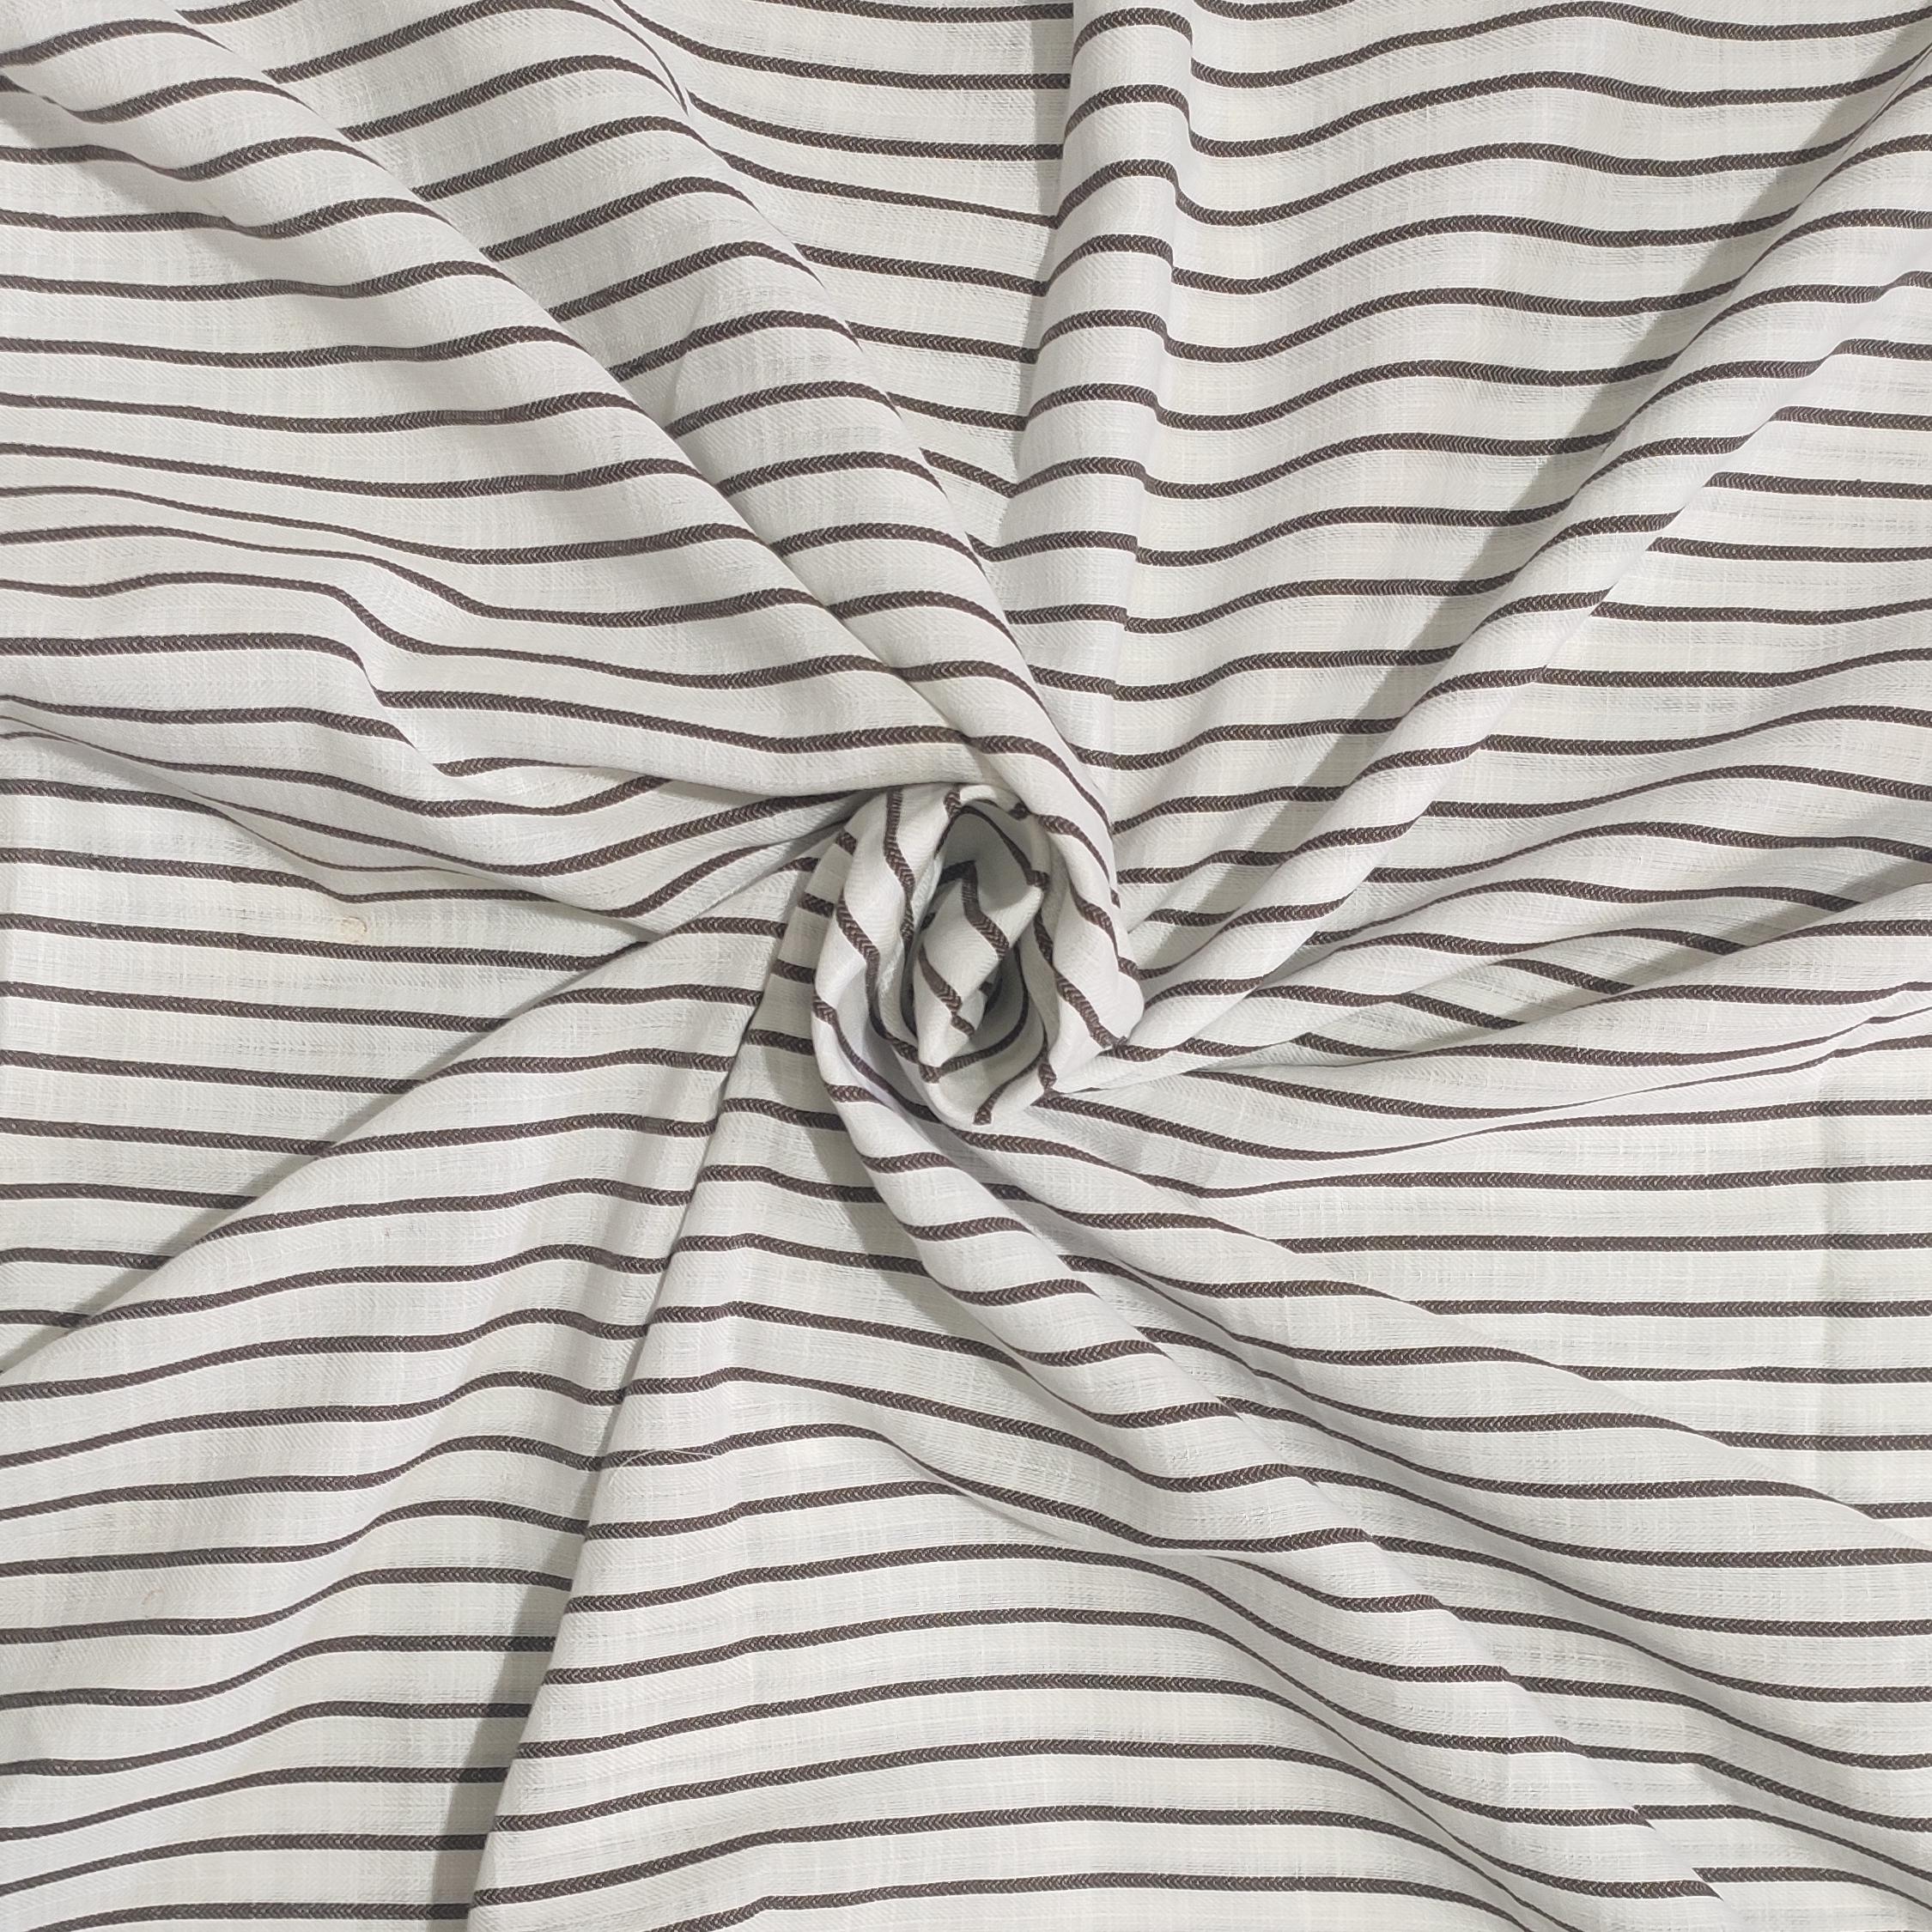 Handwoven wave twill arrow design  cotton fabric